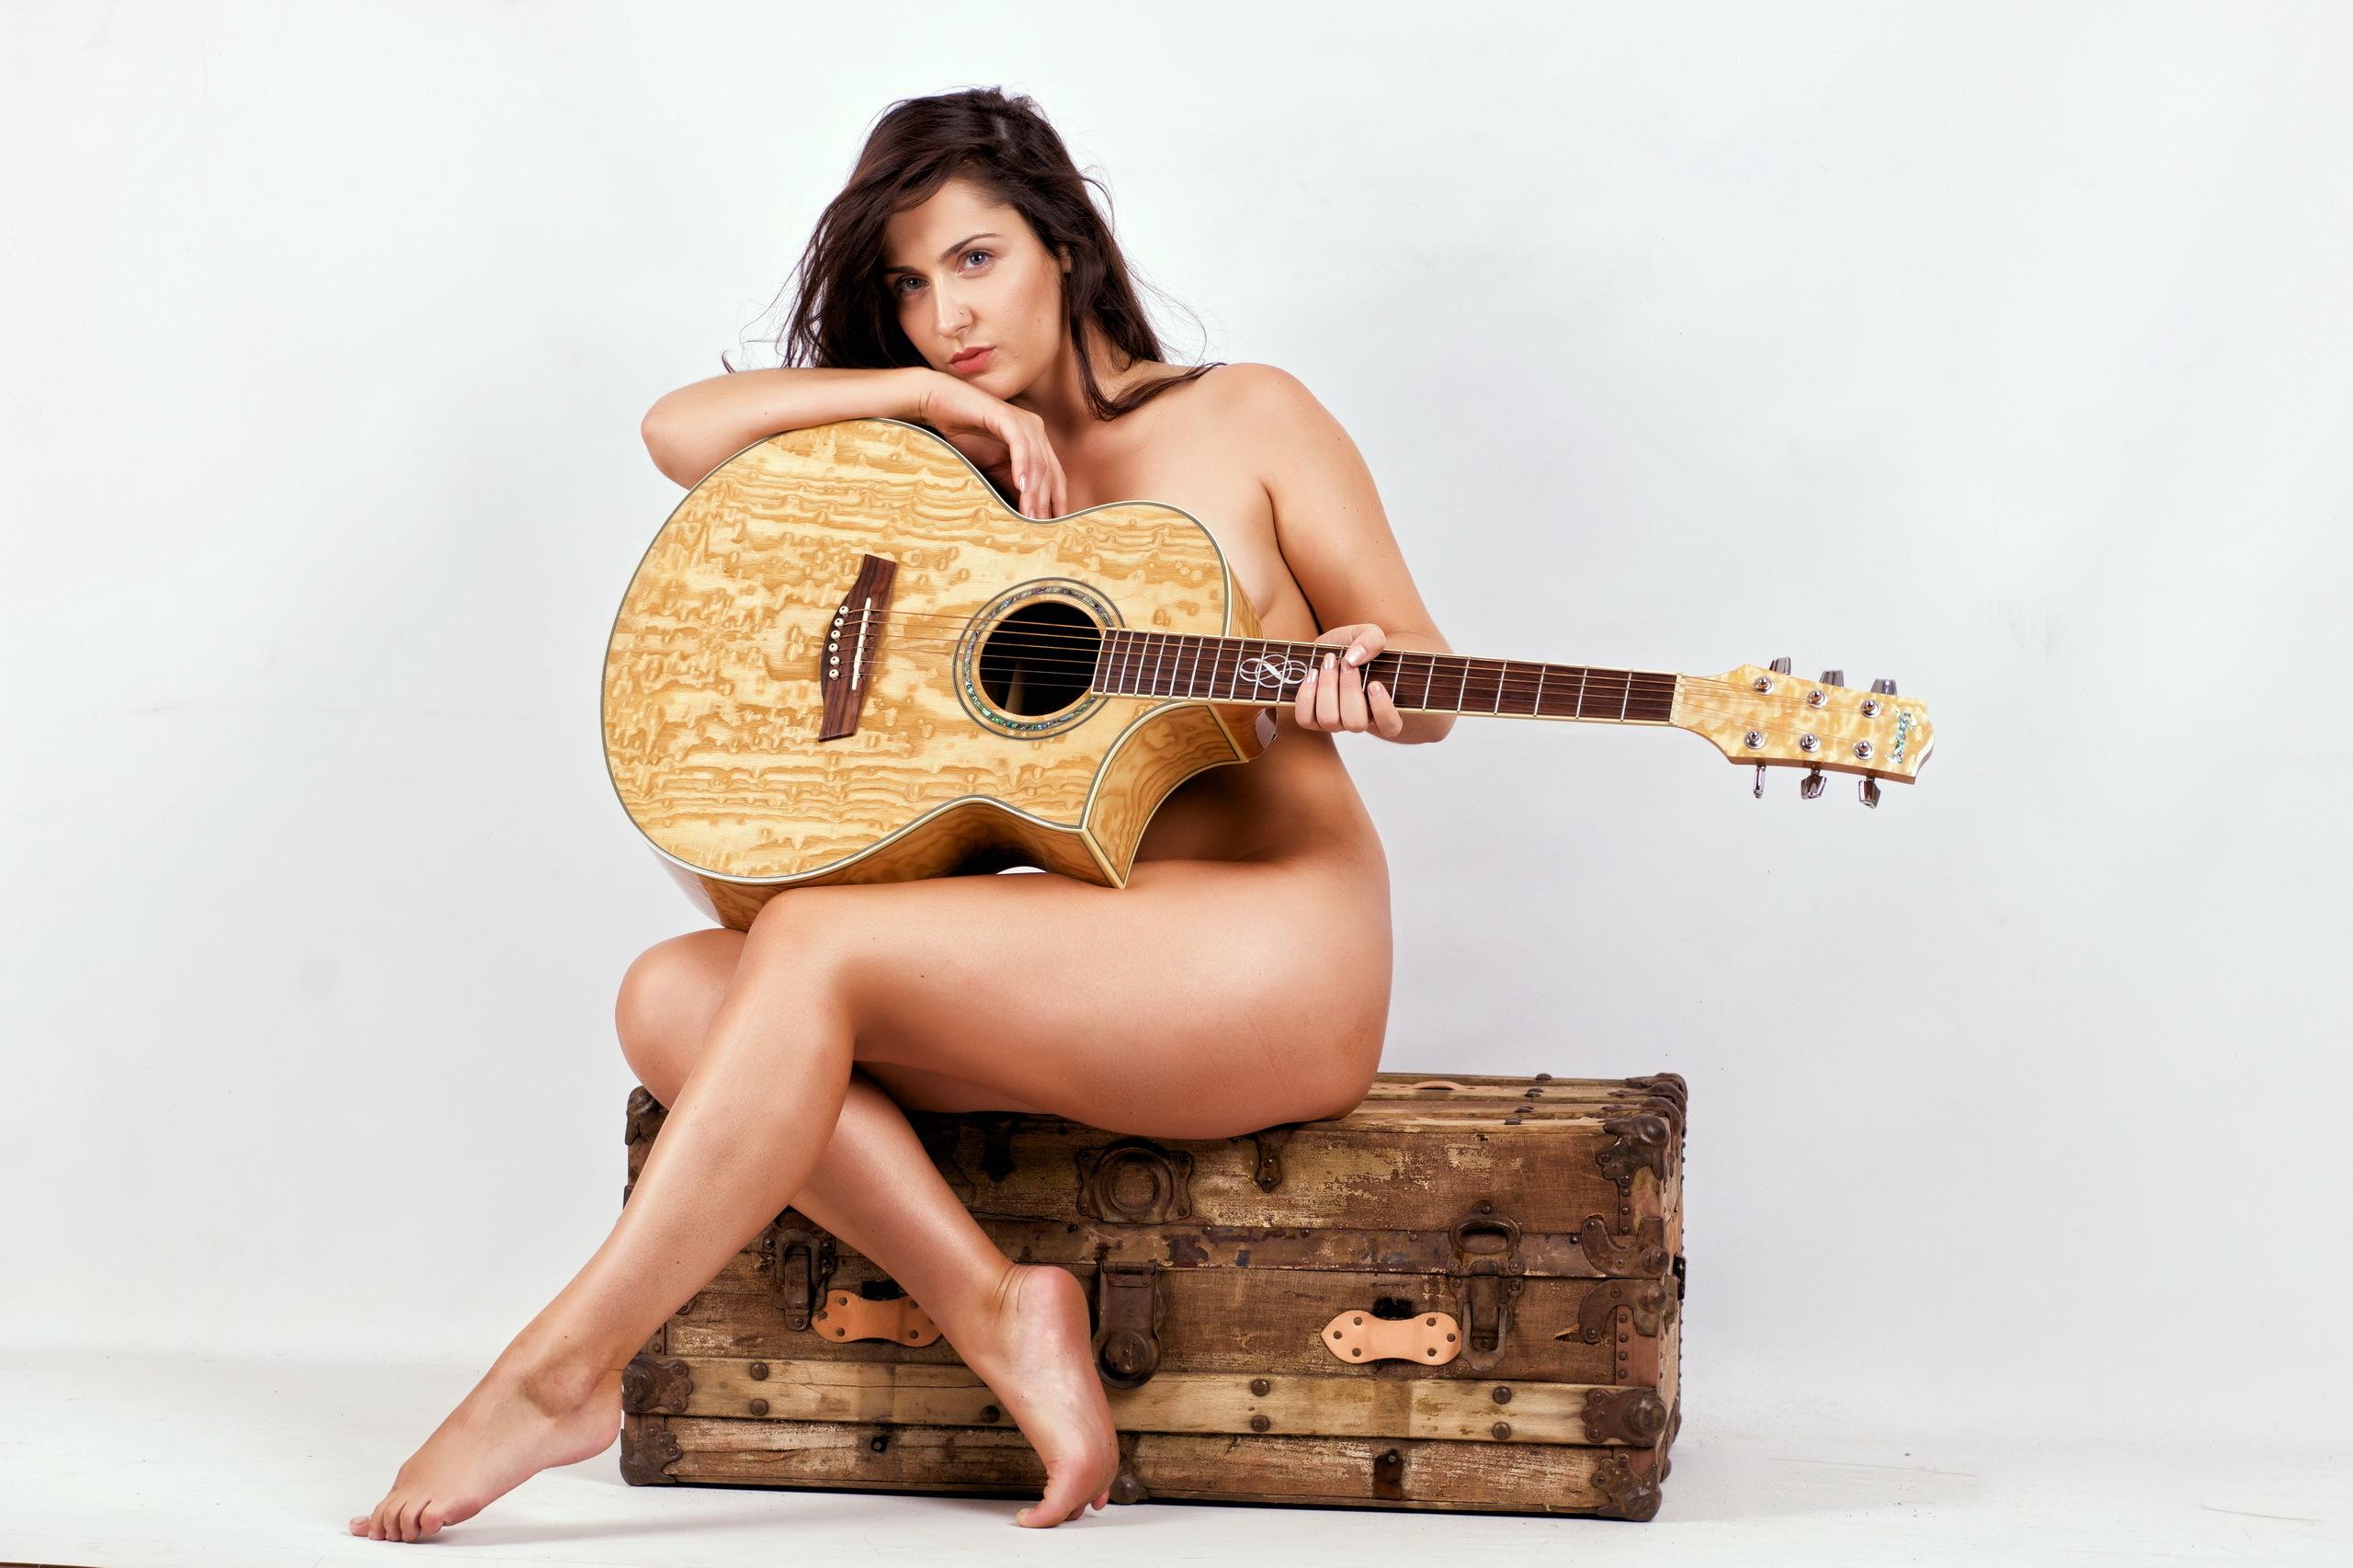 Nude girls with bass guitar